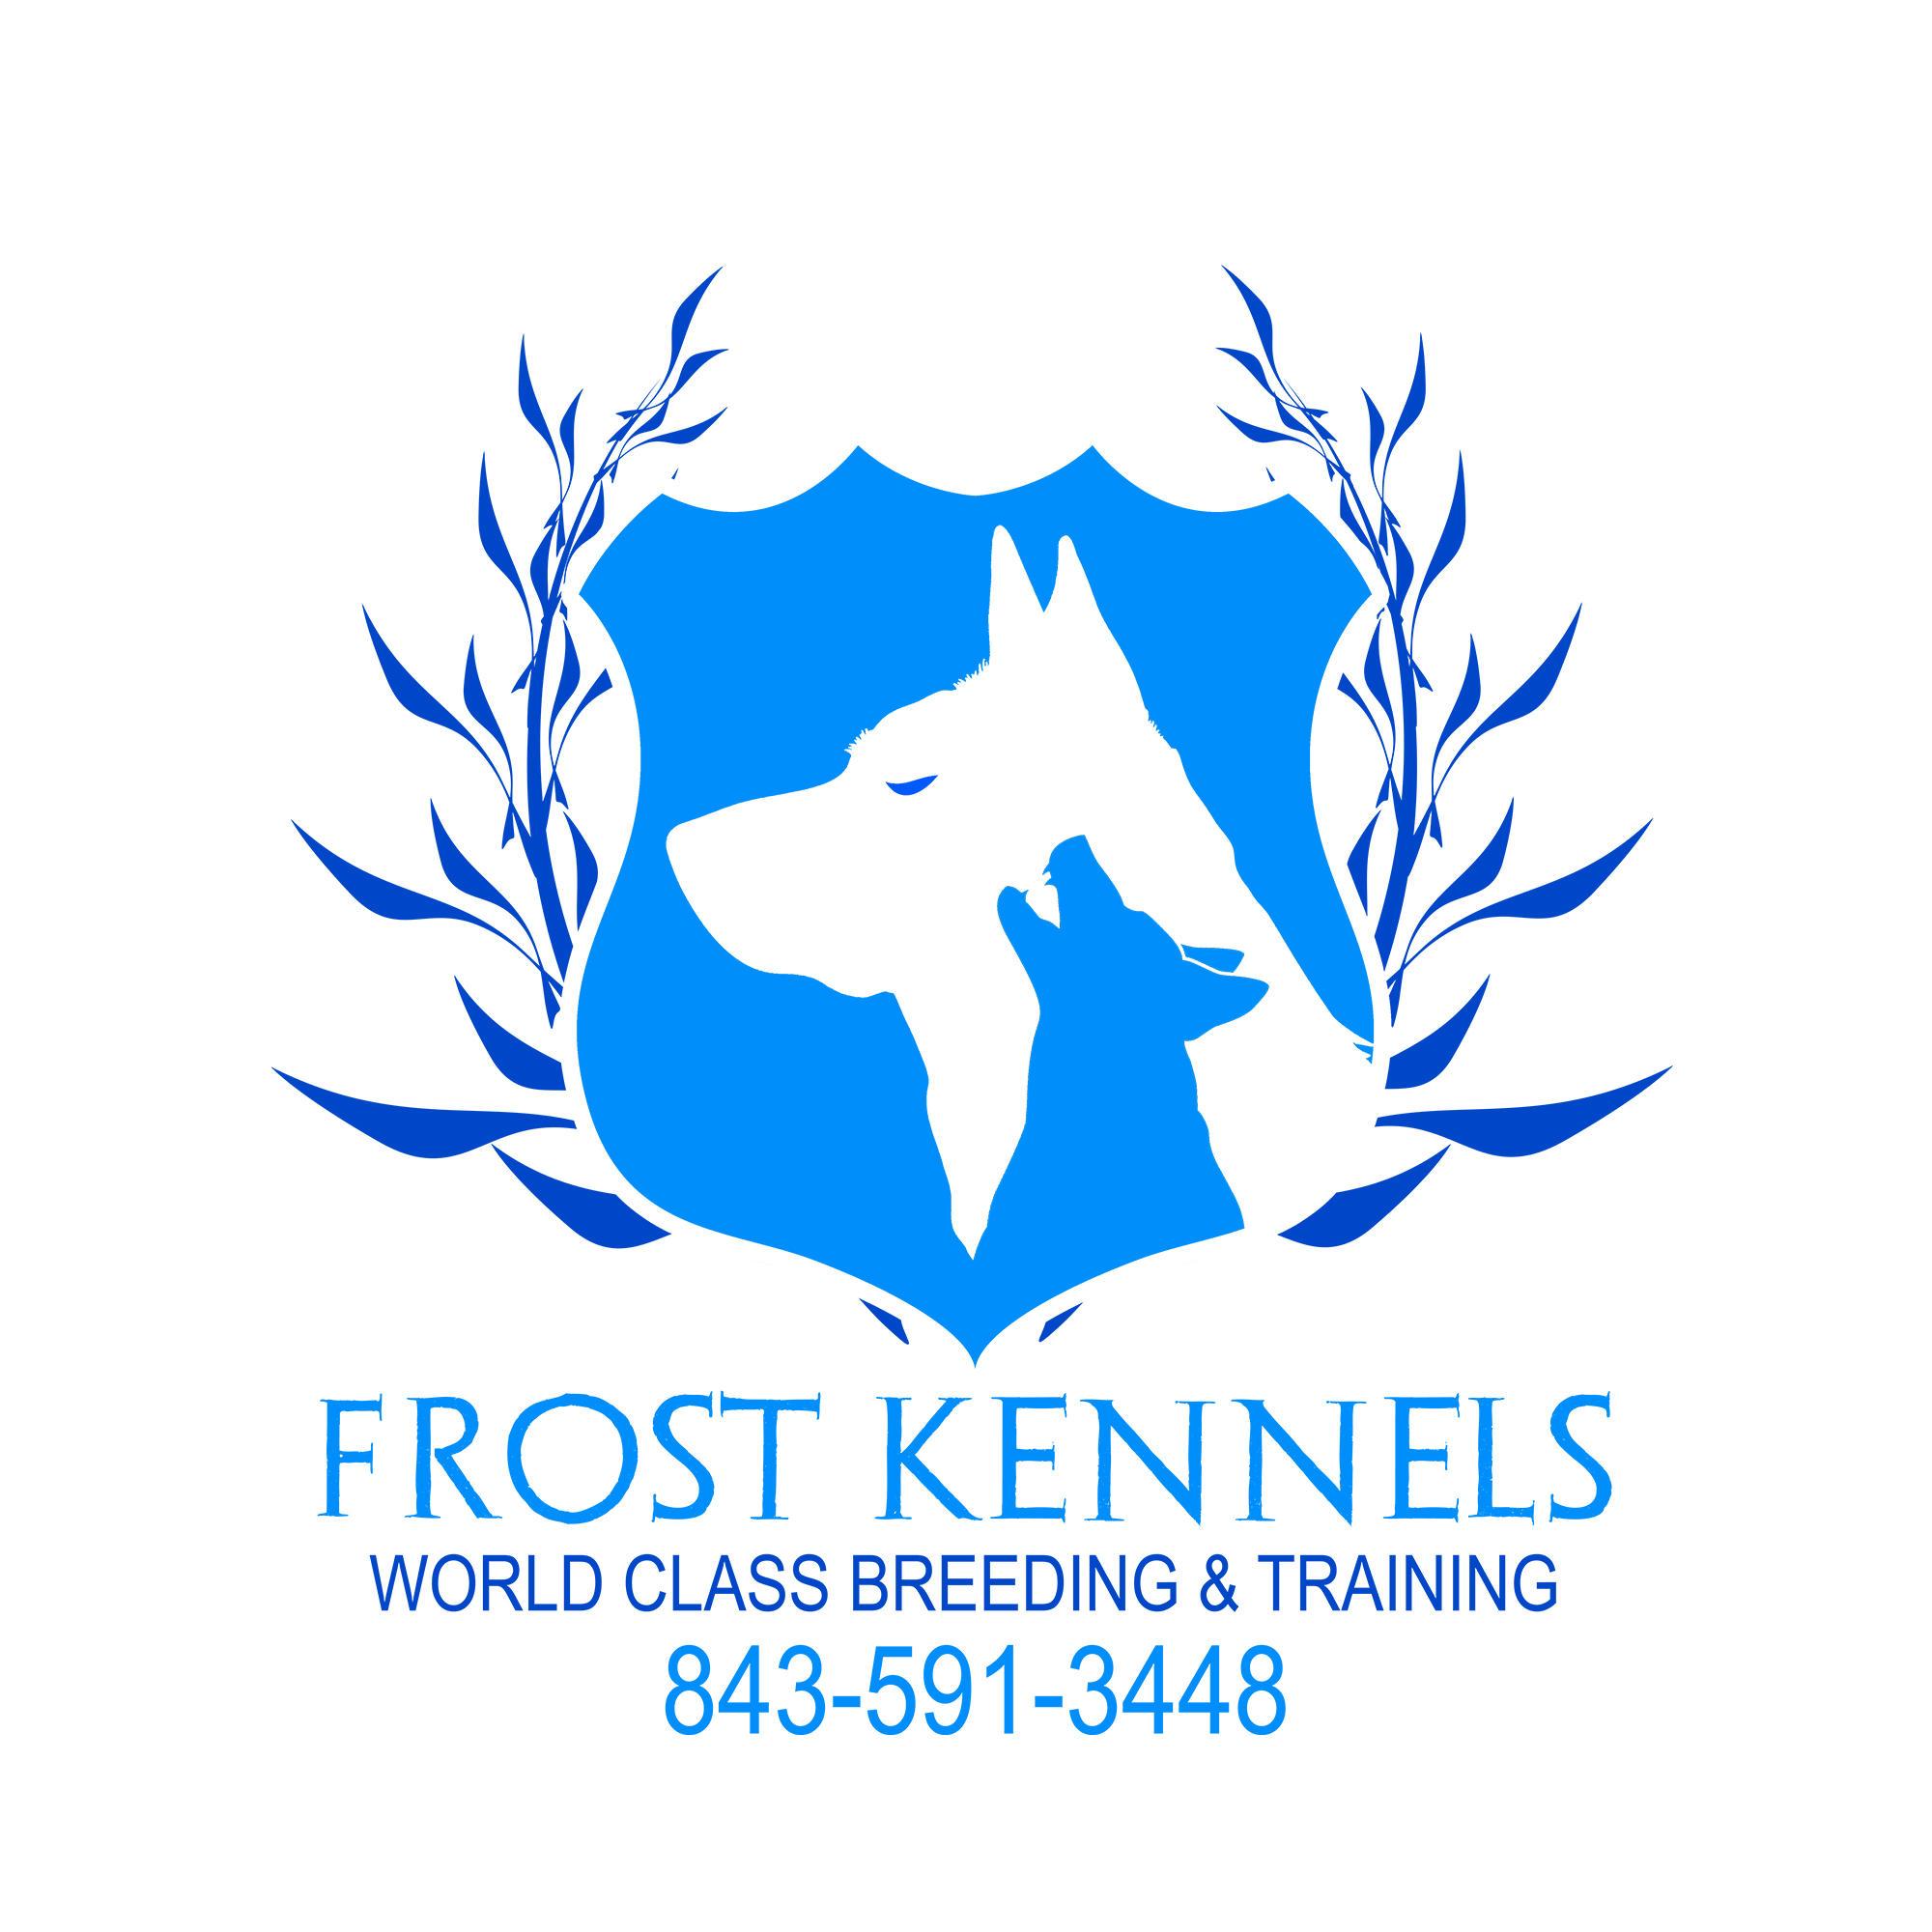 Frost Kennels